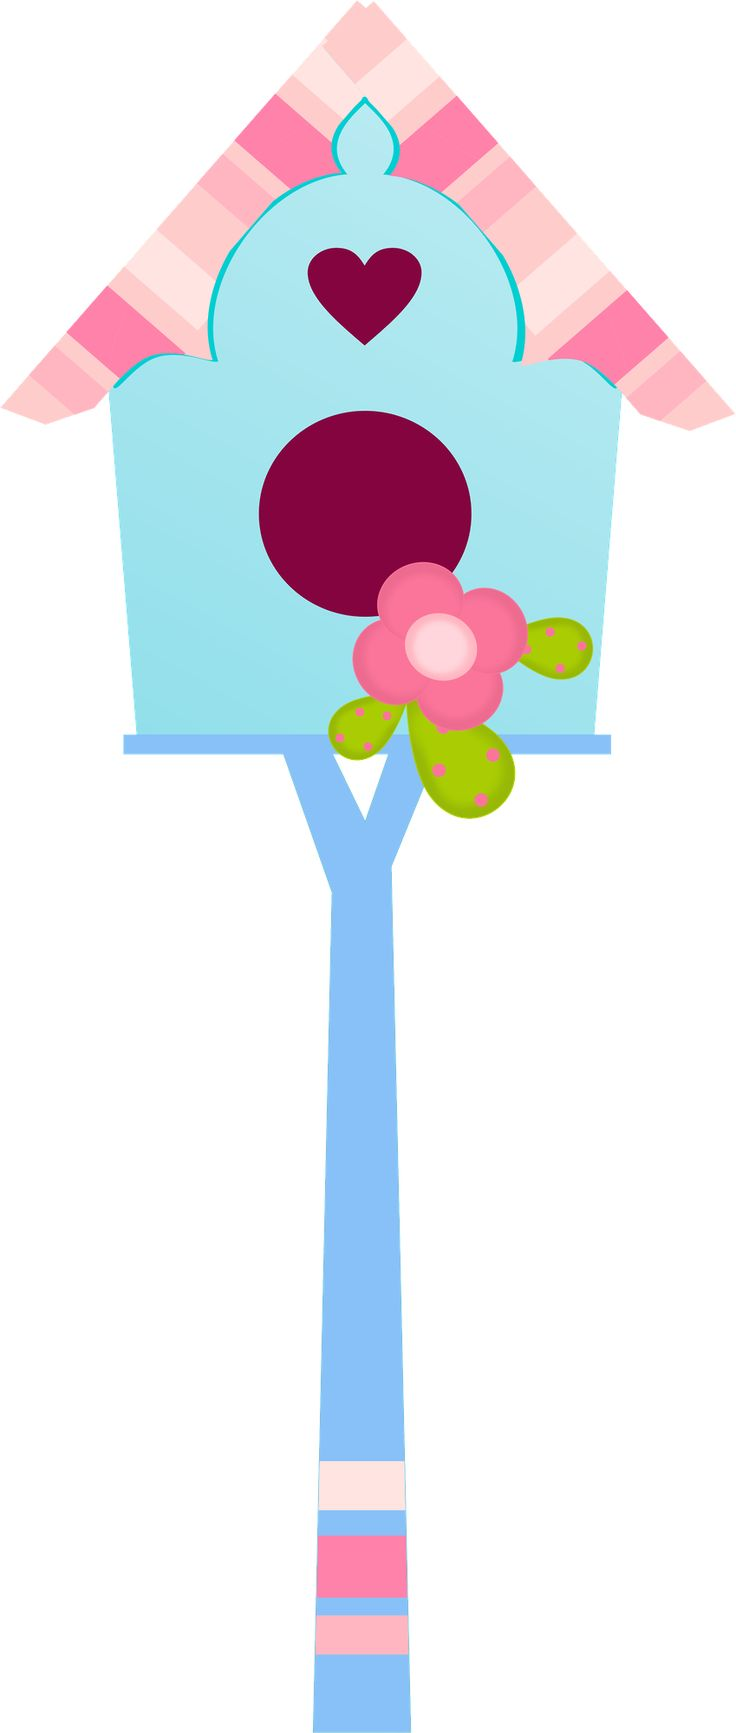 Image of birdhouse clipart 1 clip art clipartoons